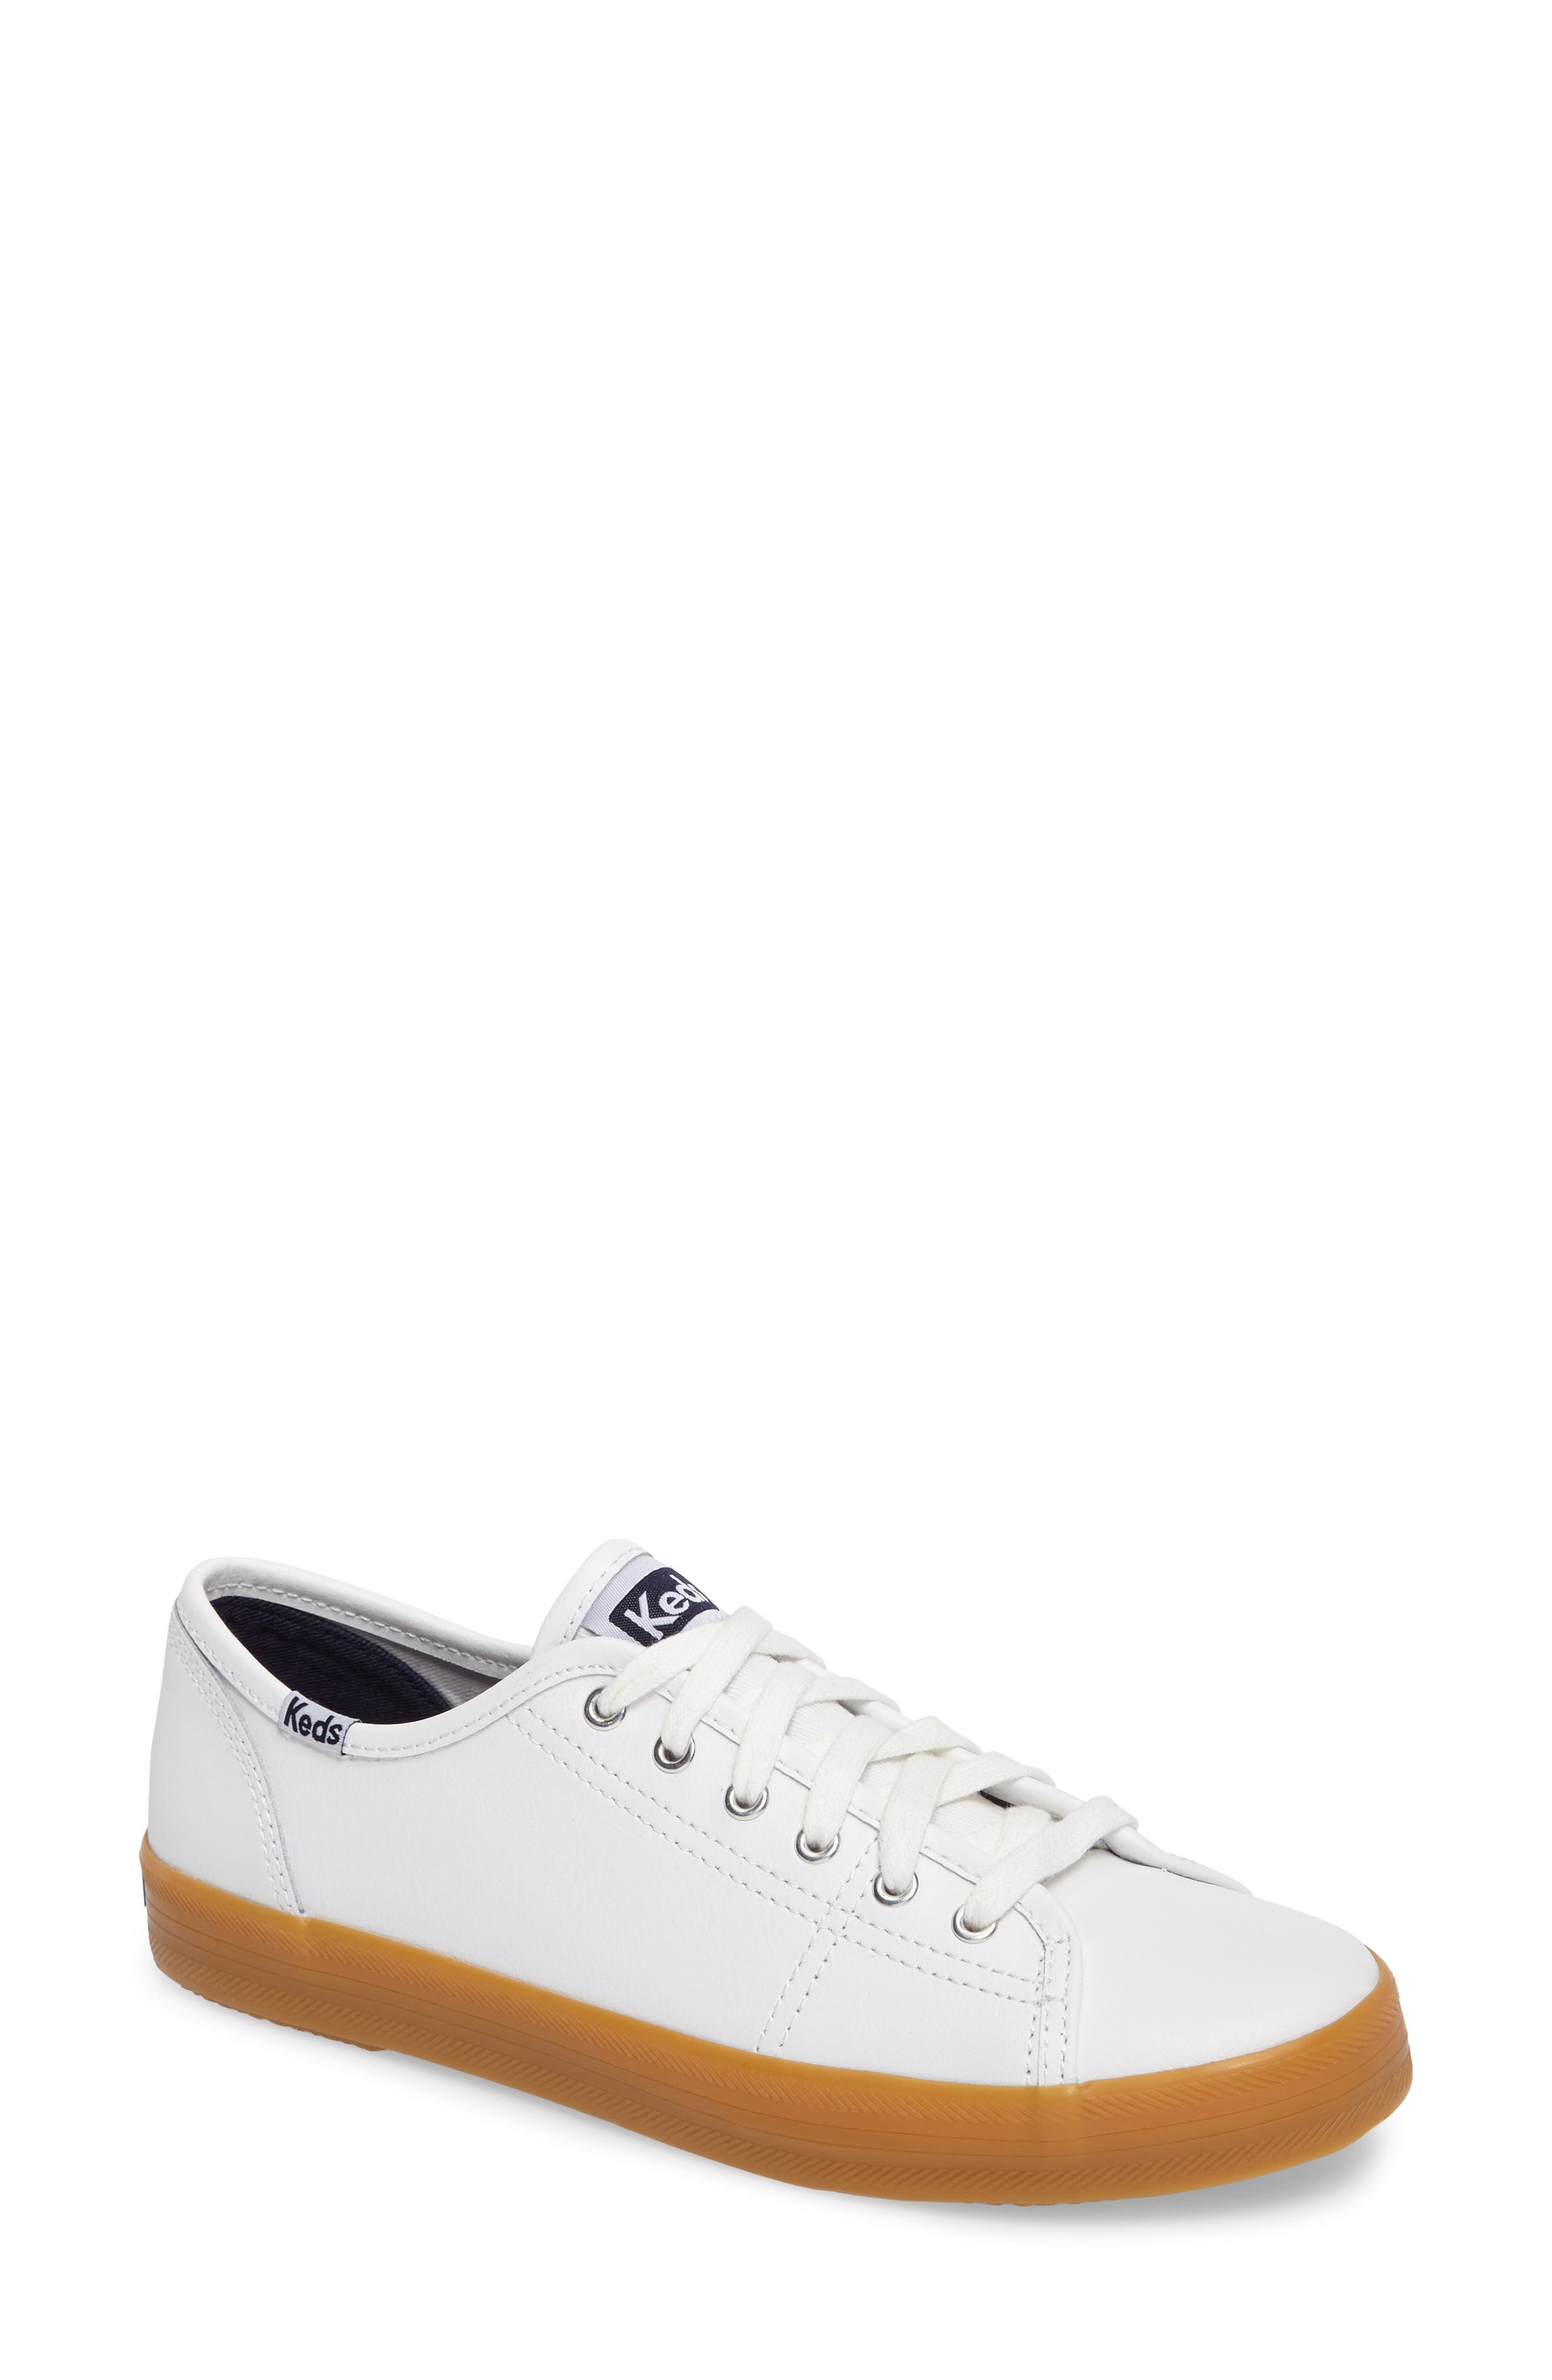 Main Image - Keds® Kickstart Sneaker (Women)